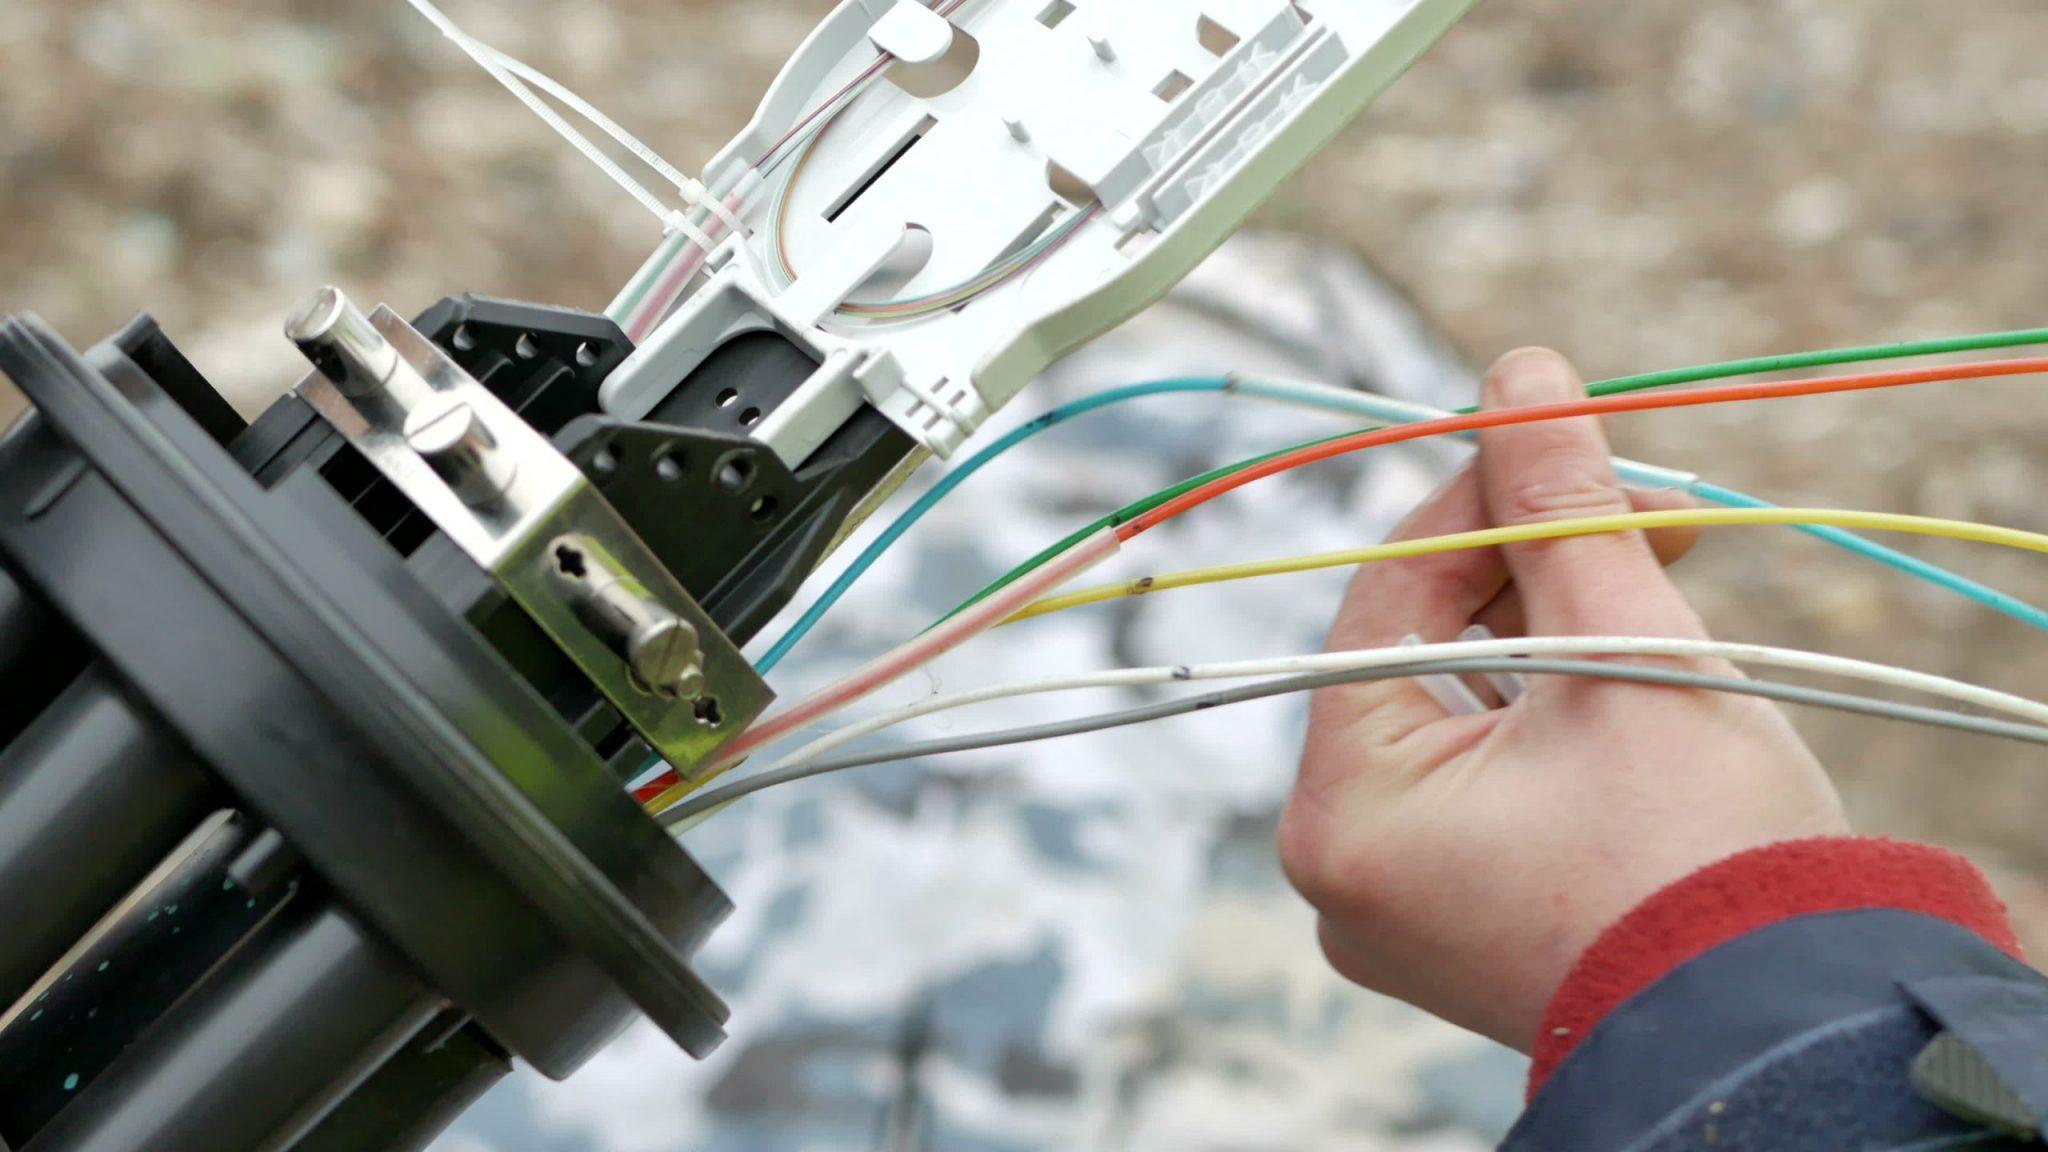 Man installing fiber optic cable into a conduit